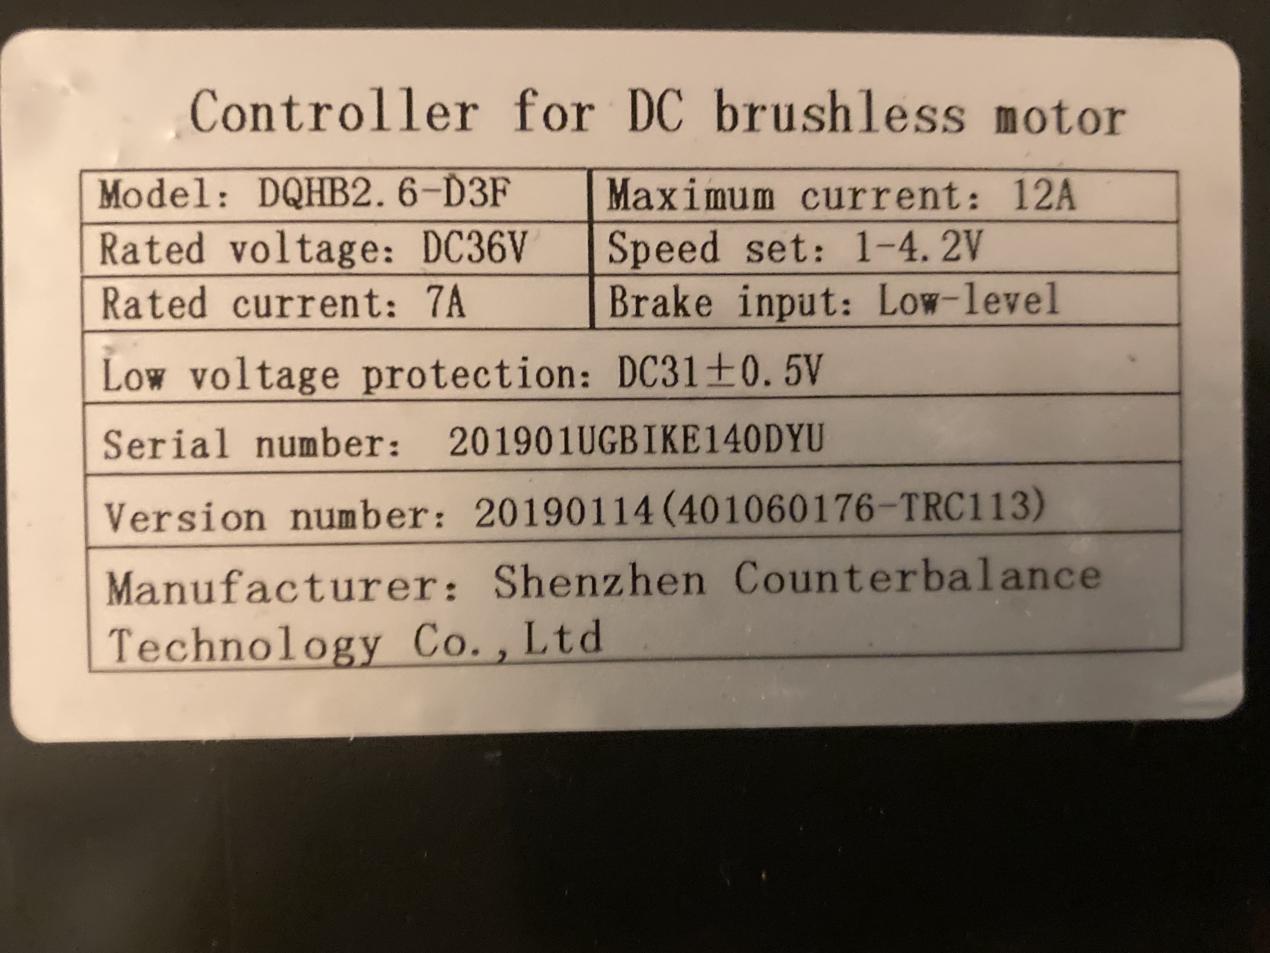 FD0A9D00-3275-4149-BFCA-74948A358900.jpeg